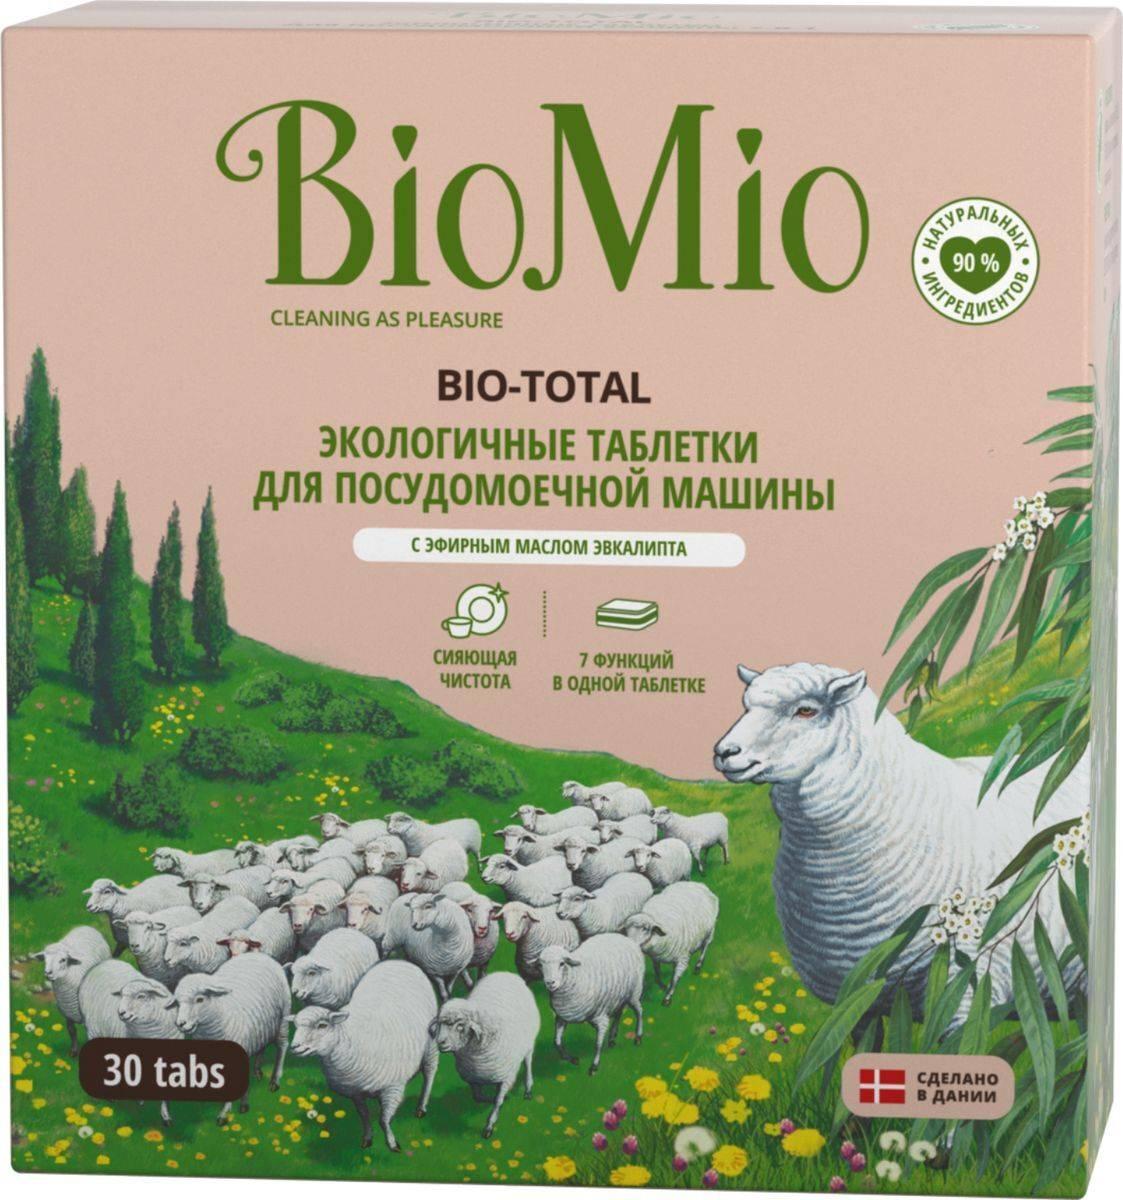 Плюсы и минусы таблеток био мио (biomio) для посудомойки - точка j